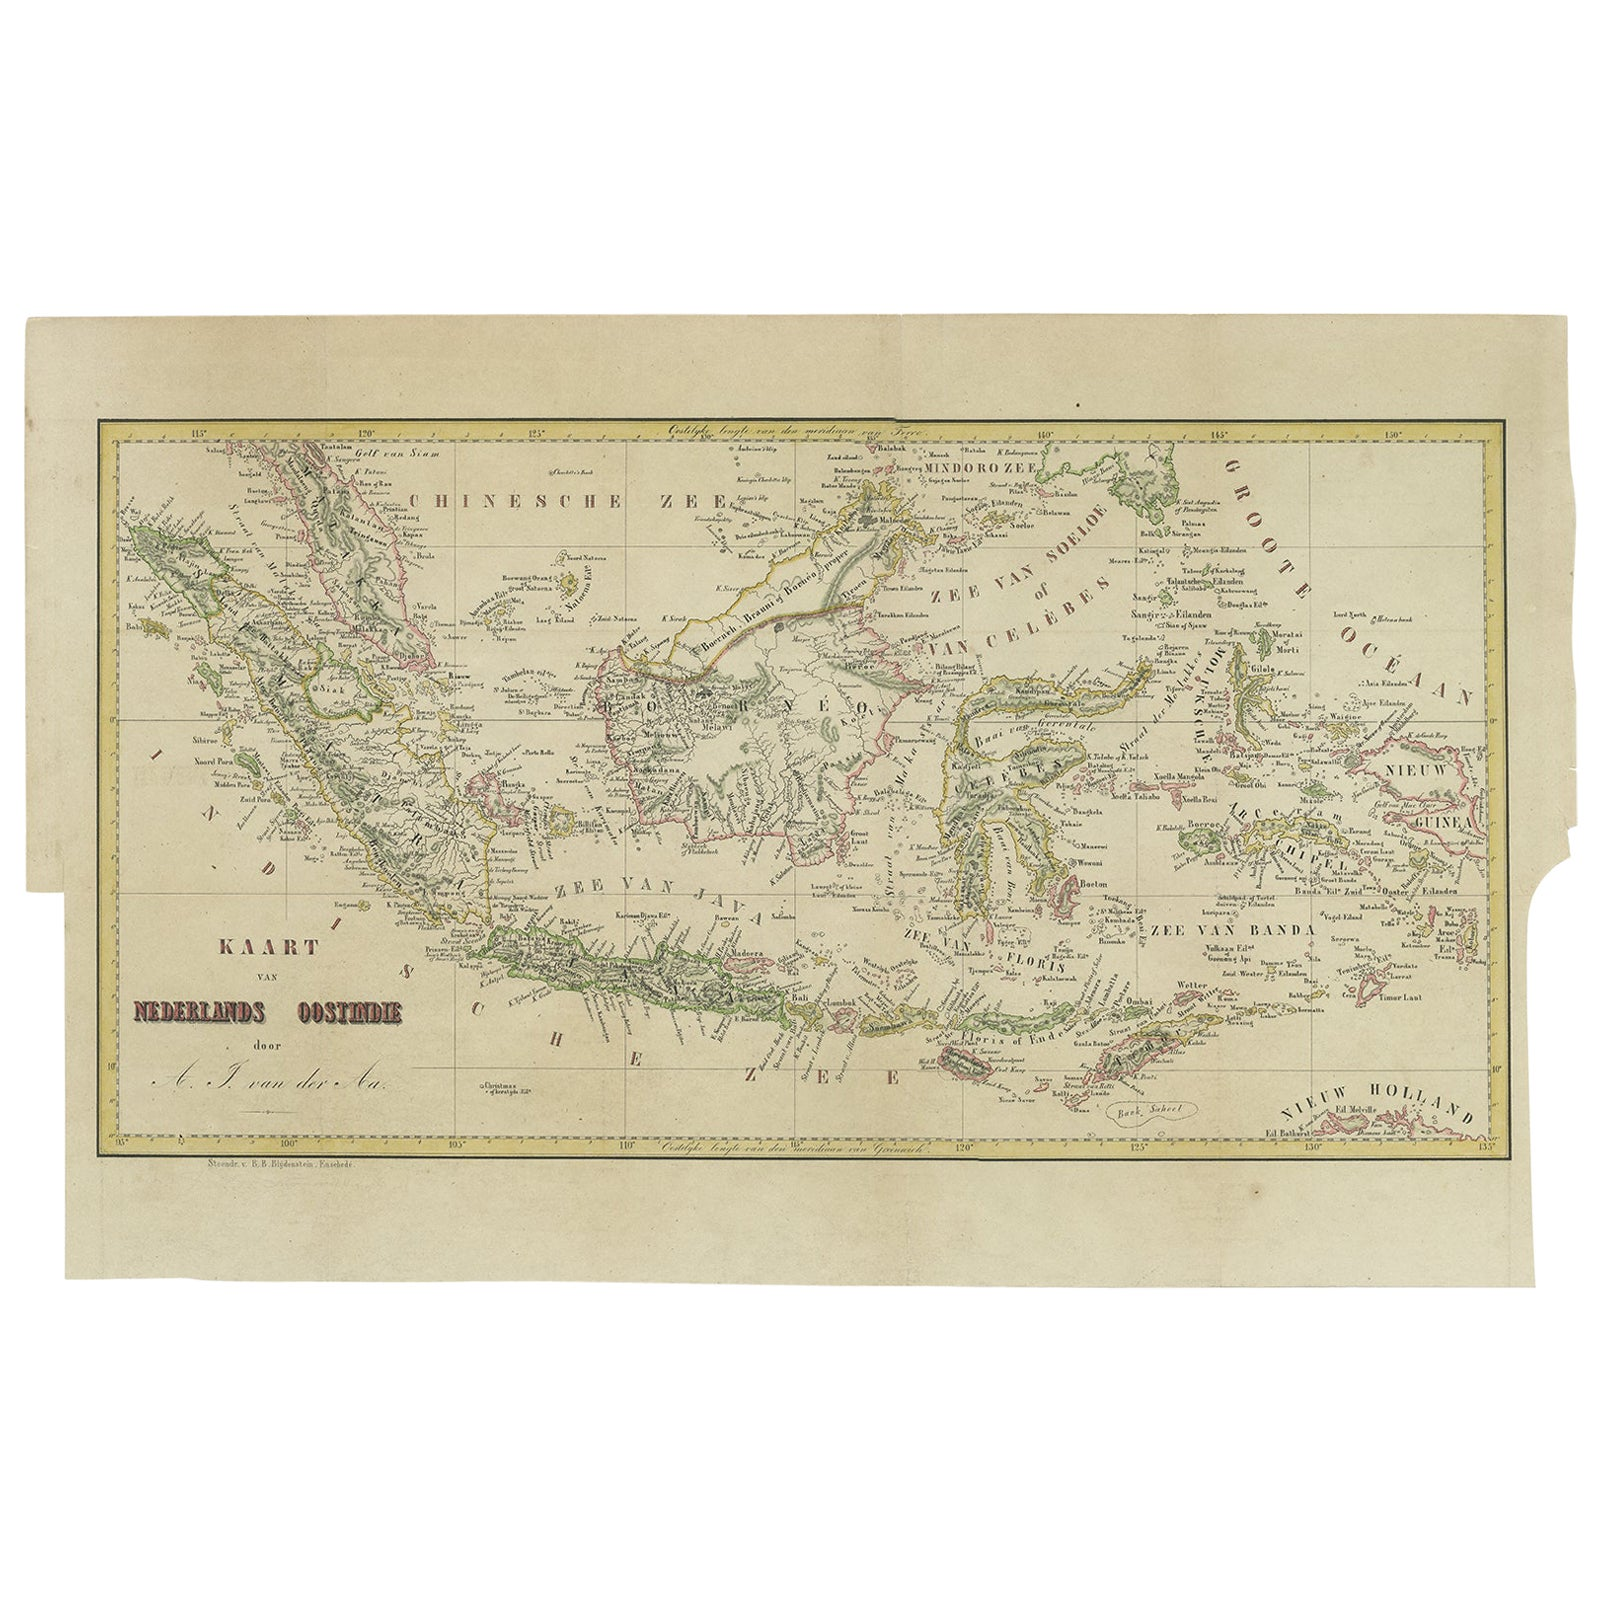 Antique Map of the East Indies by Van der Aa '1849'